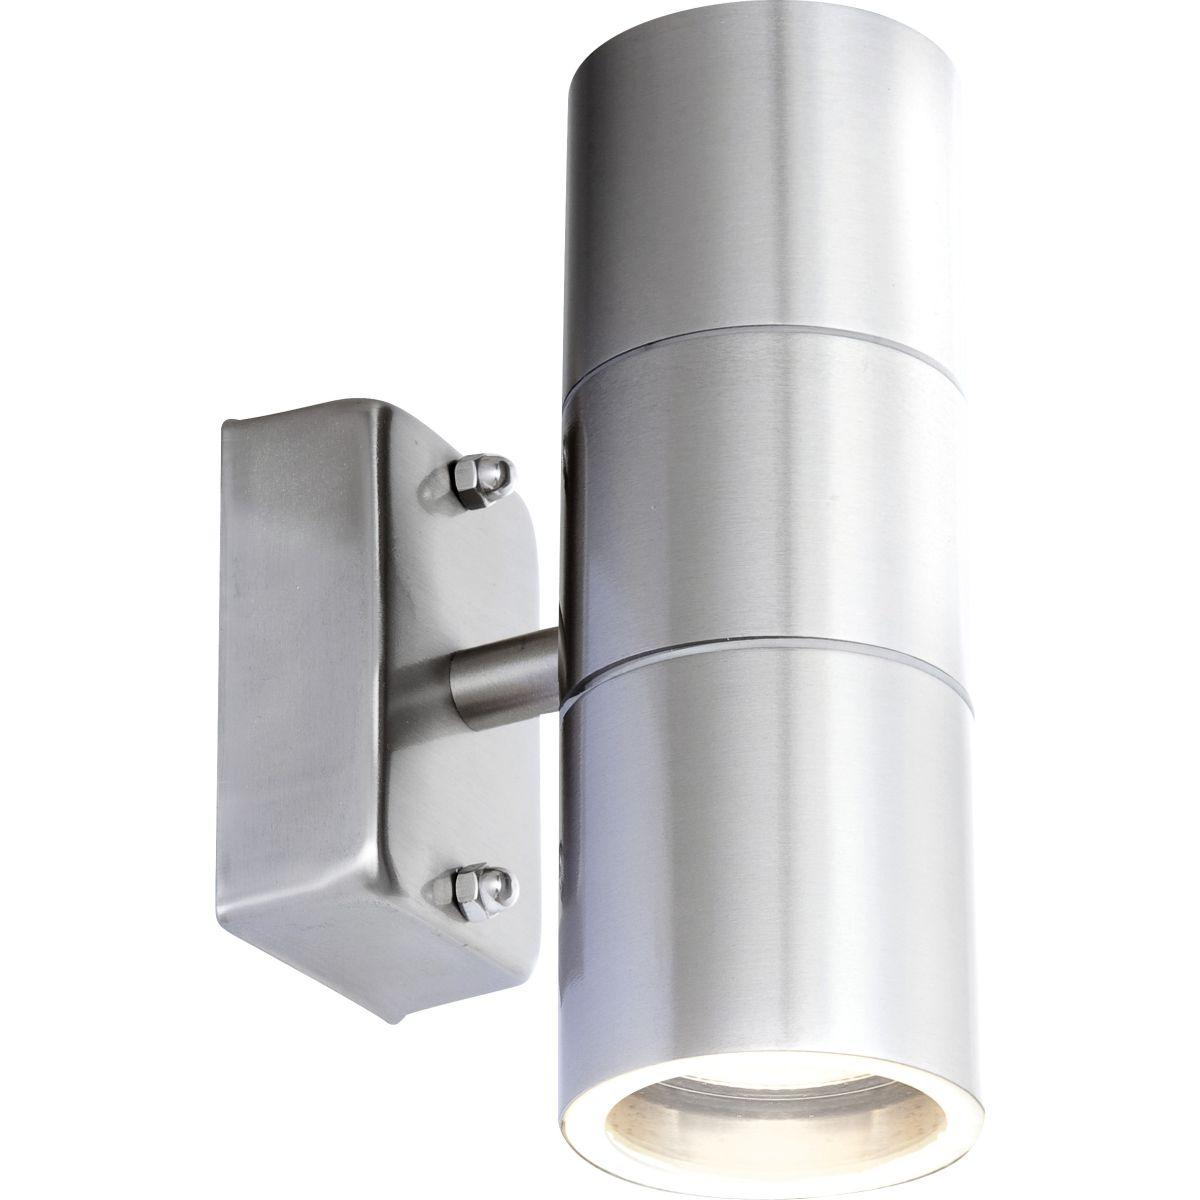 Globo 3201-2 Уличный настенно-потолочный светильник STYLE 2x35W GU10 хром